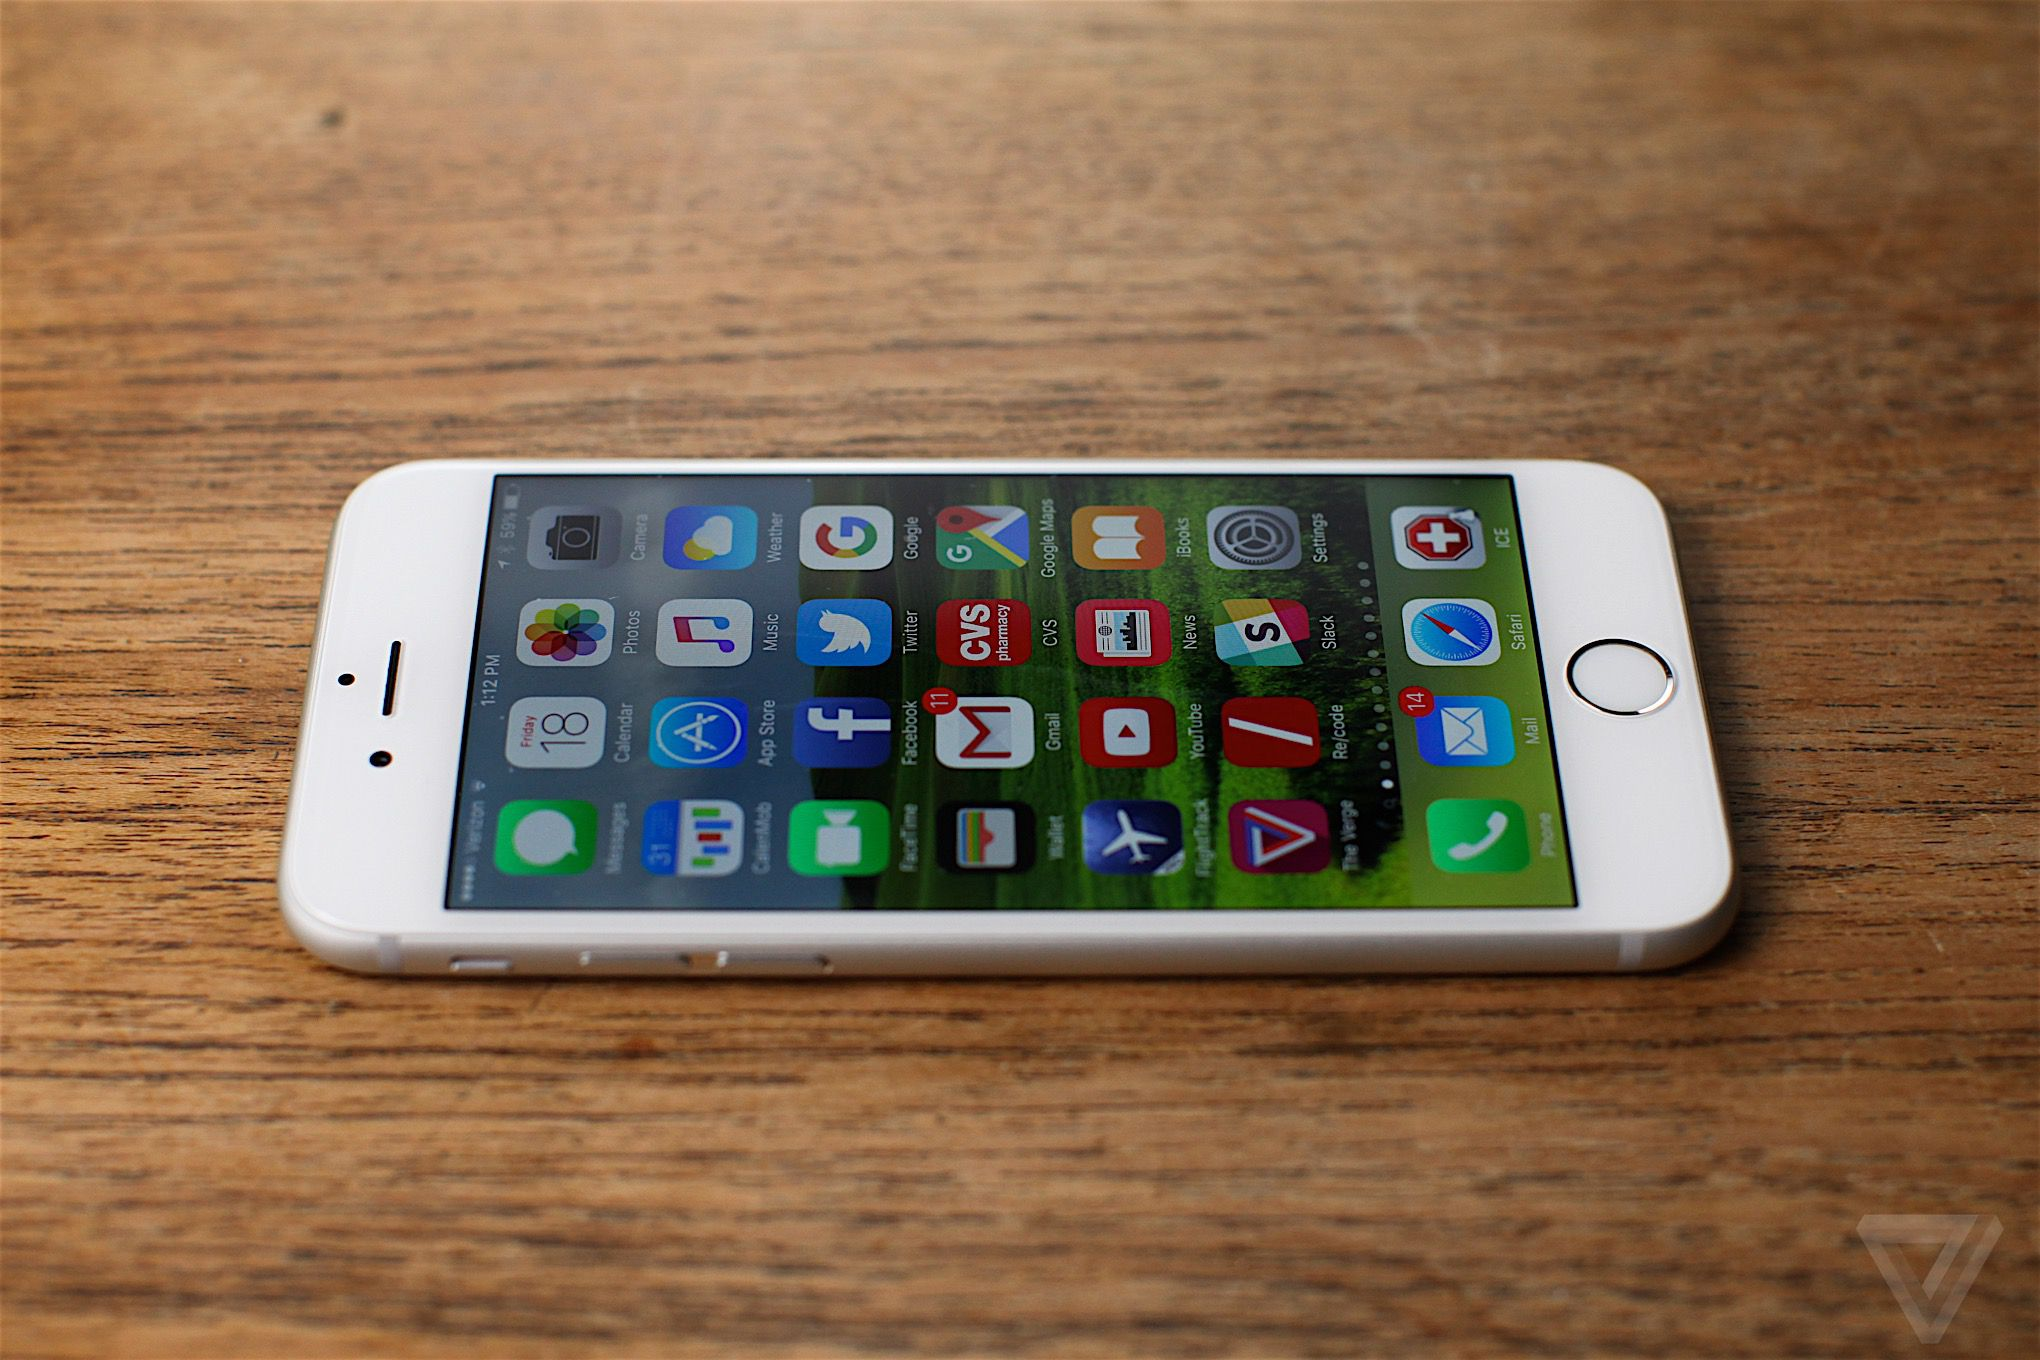 Mossberg iphone 6s